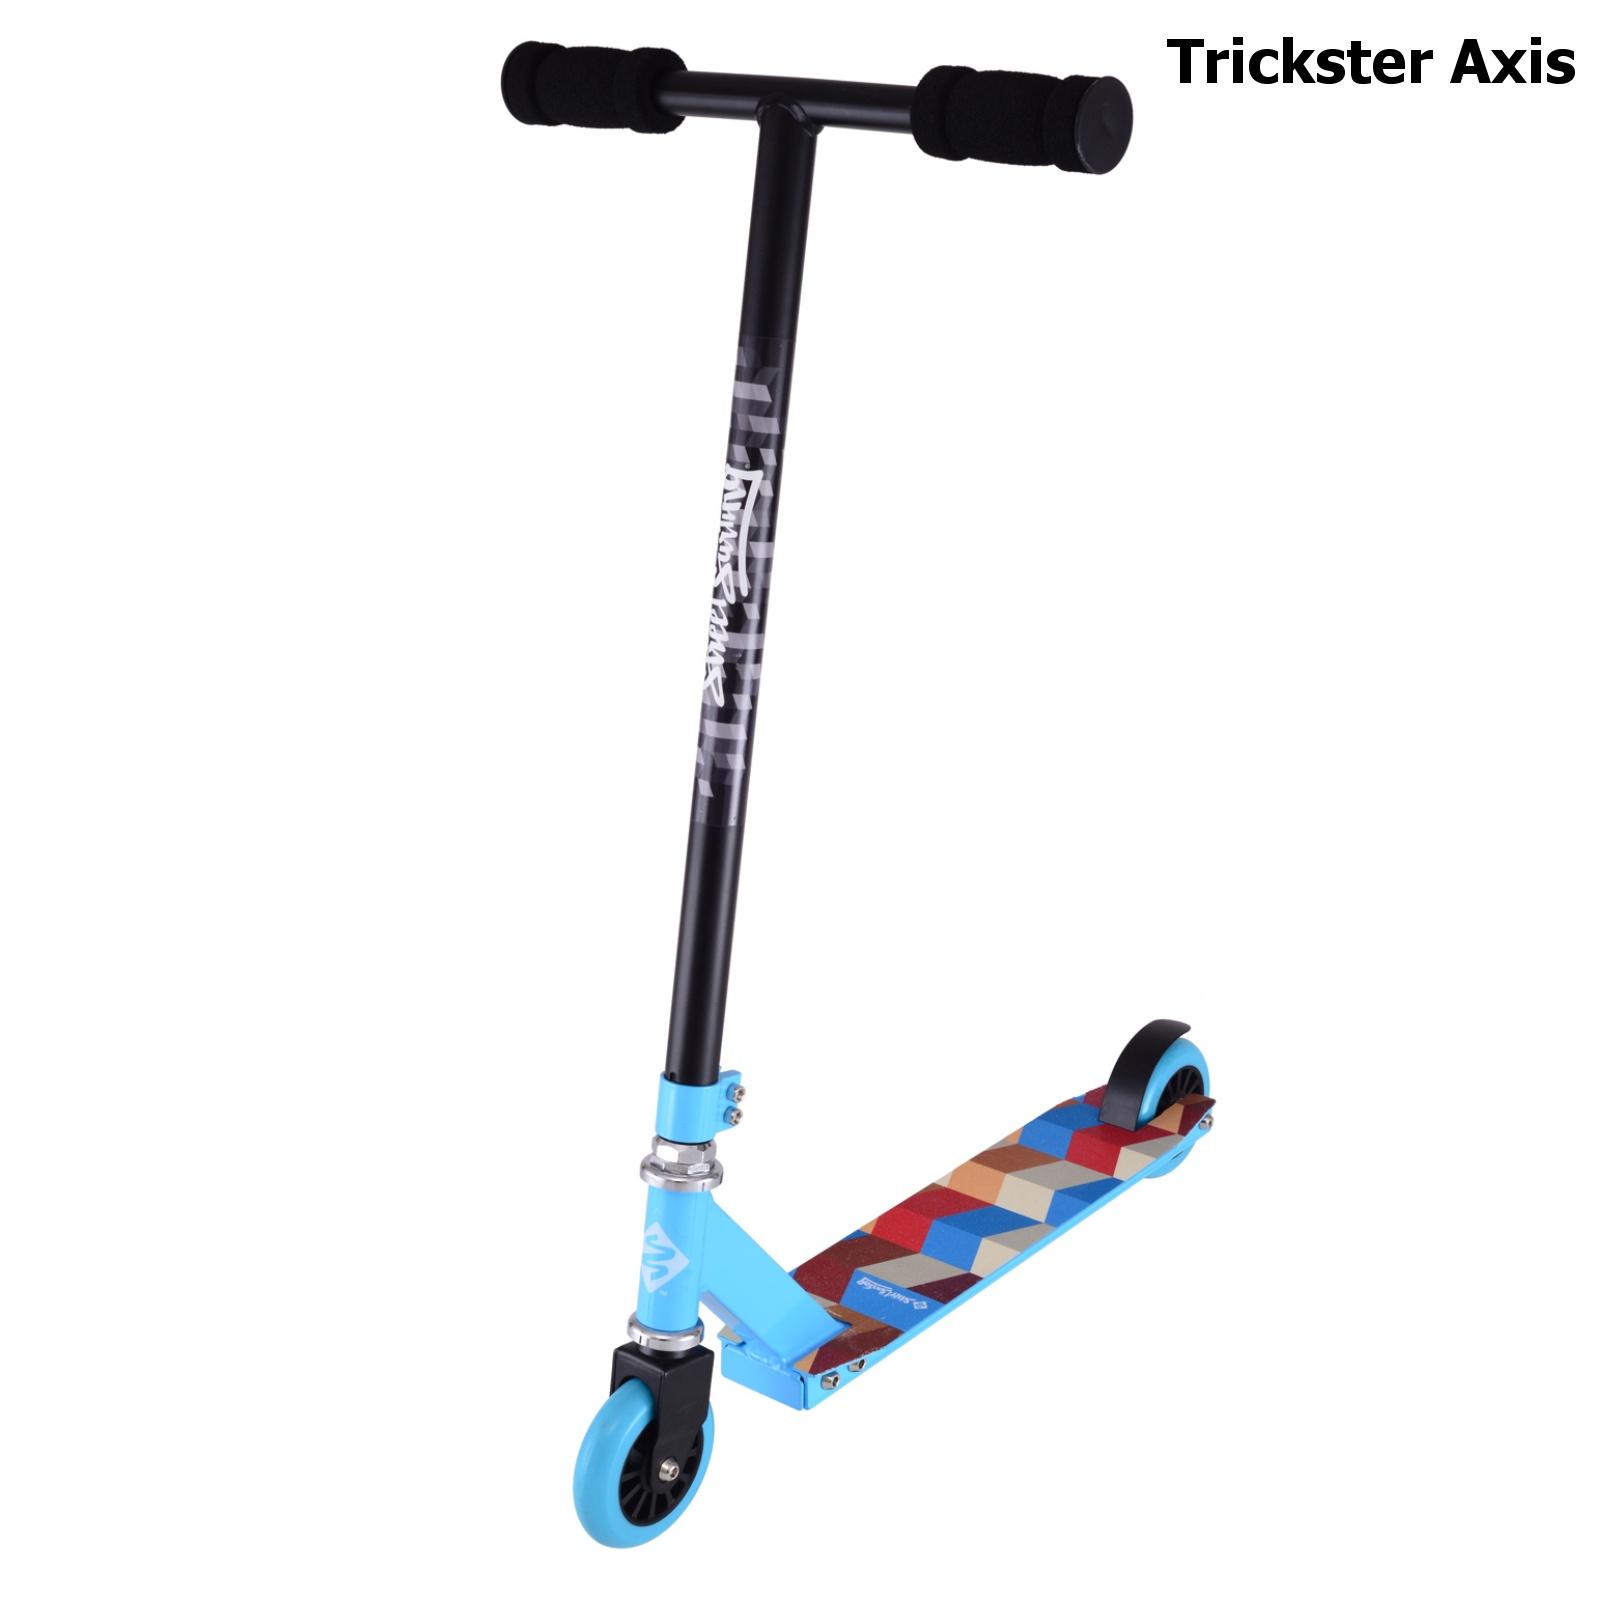 Freestylová koloběžka STREET SURFING Trickster Axis modro-černá